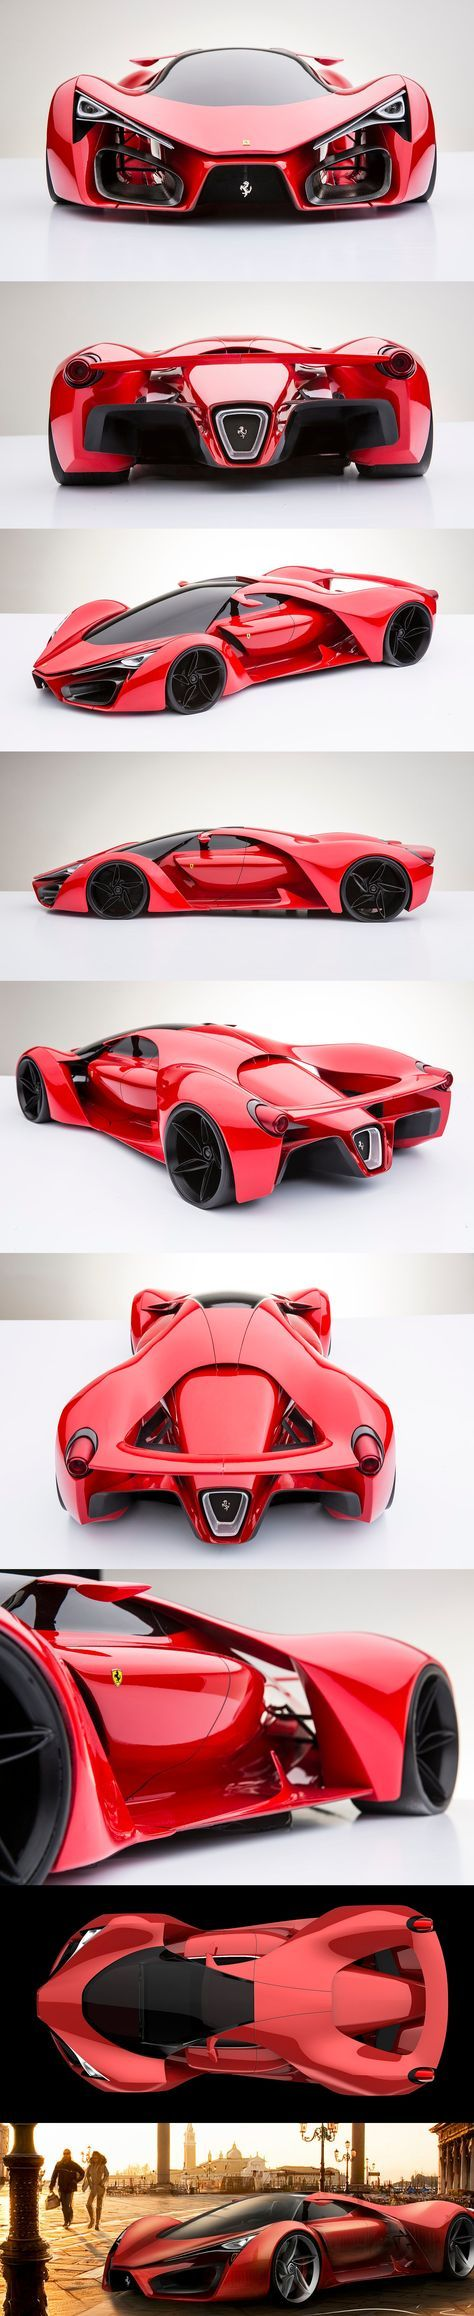 Ferrari F80 Supercar Concept    re-pinned by http://www.wfpcc.com/junobeachrealestate.php